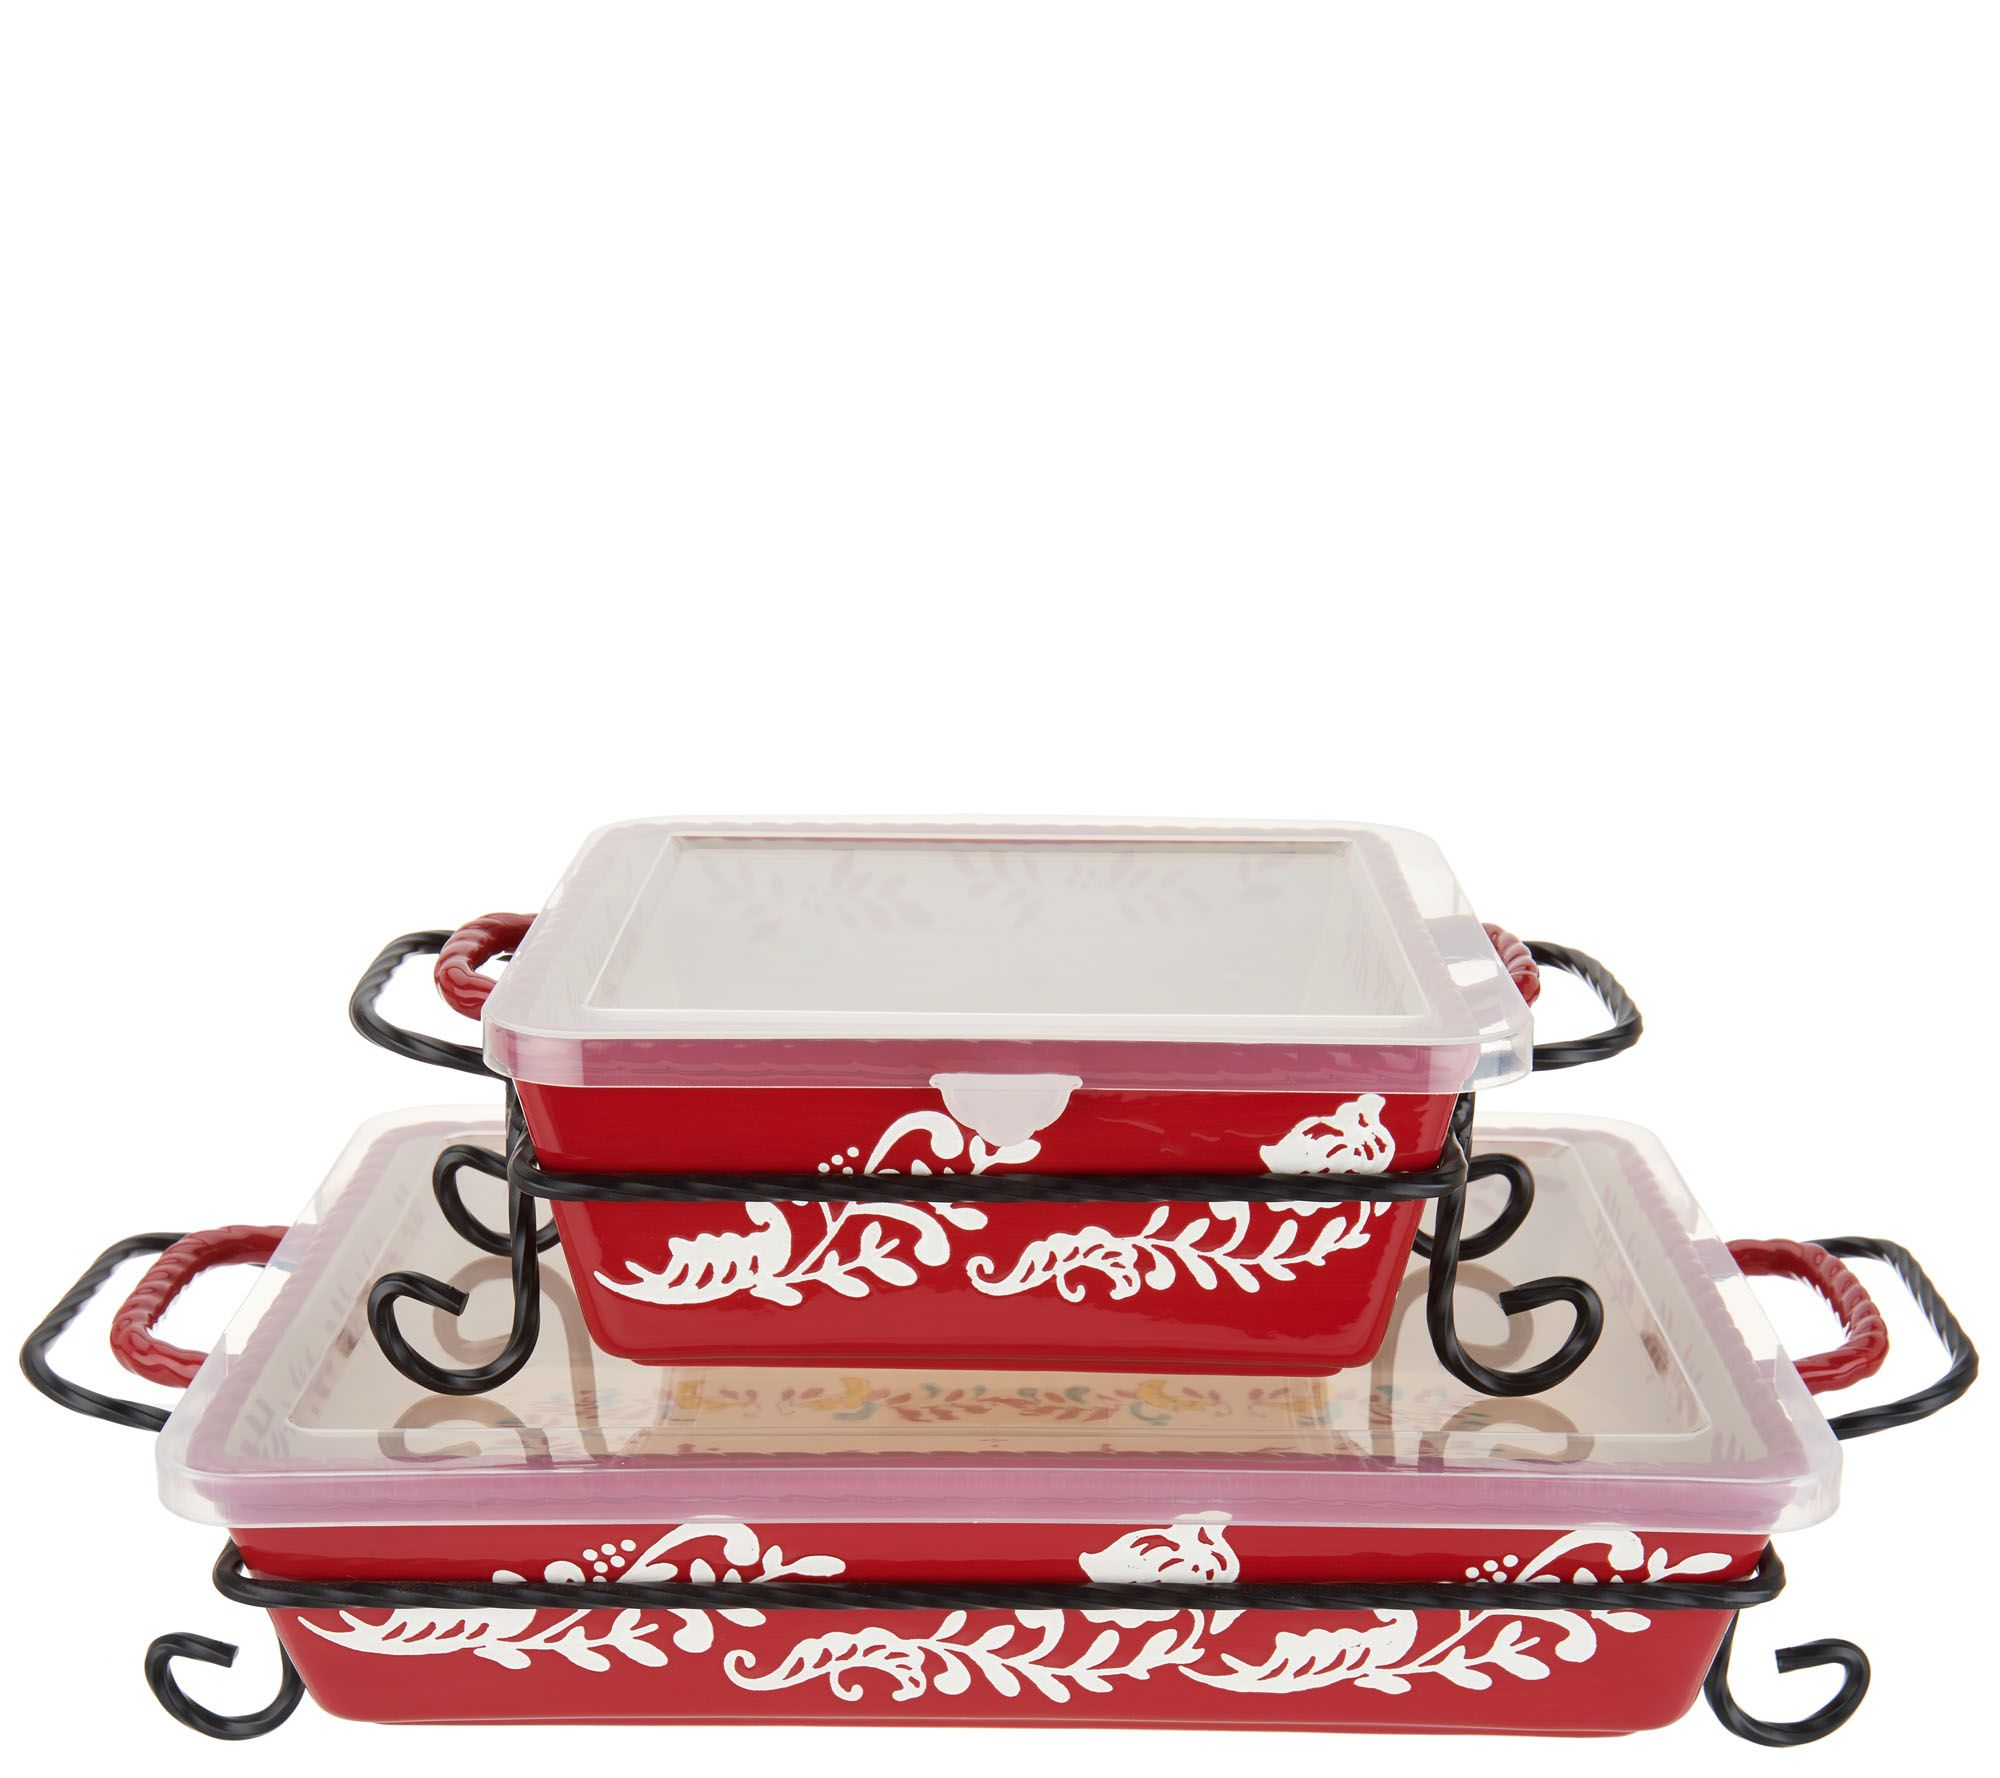 Valerie Bertinelli 4 Piece Bake Serve Set W Lids Model K46773 Walmart Com Walmart Com